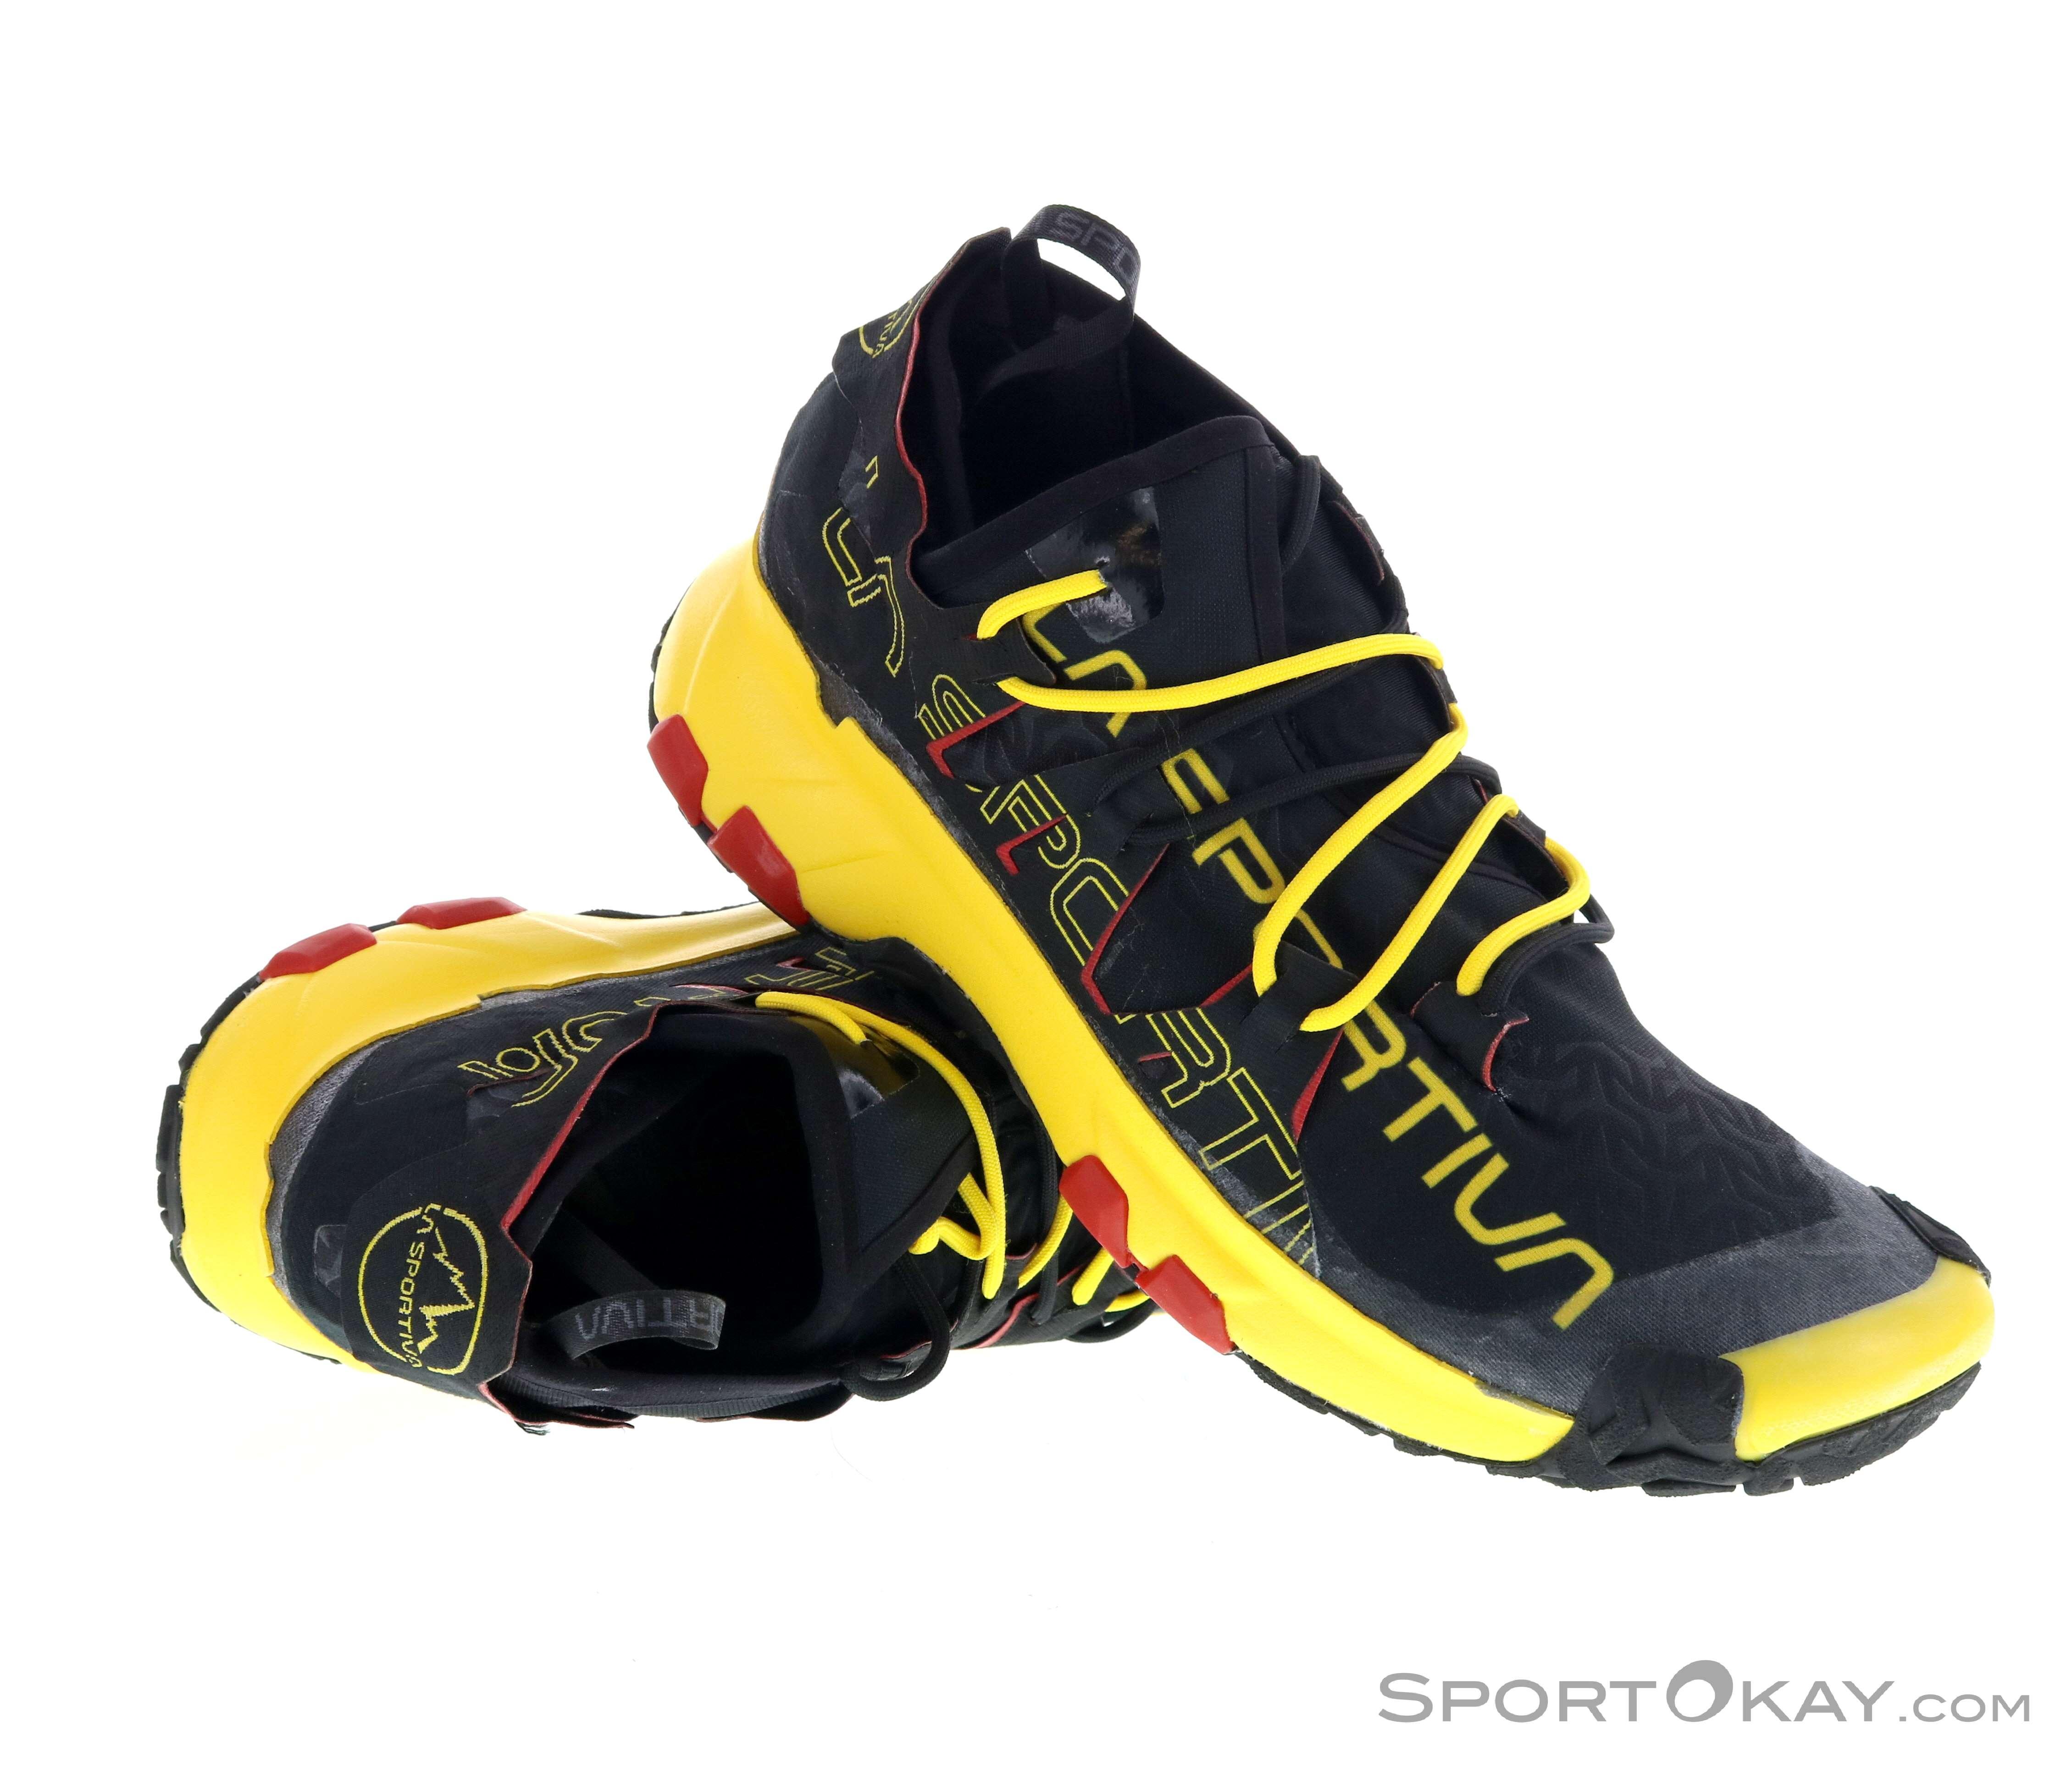 la sportiva trail runners